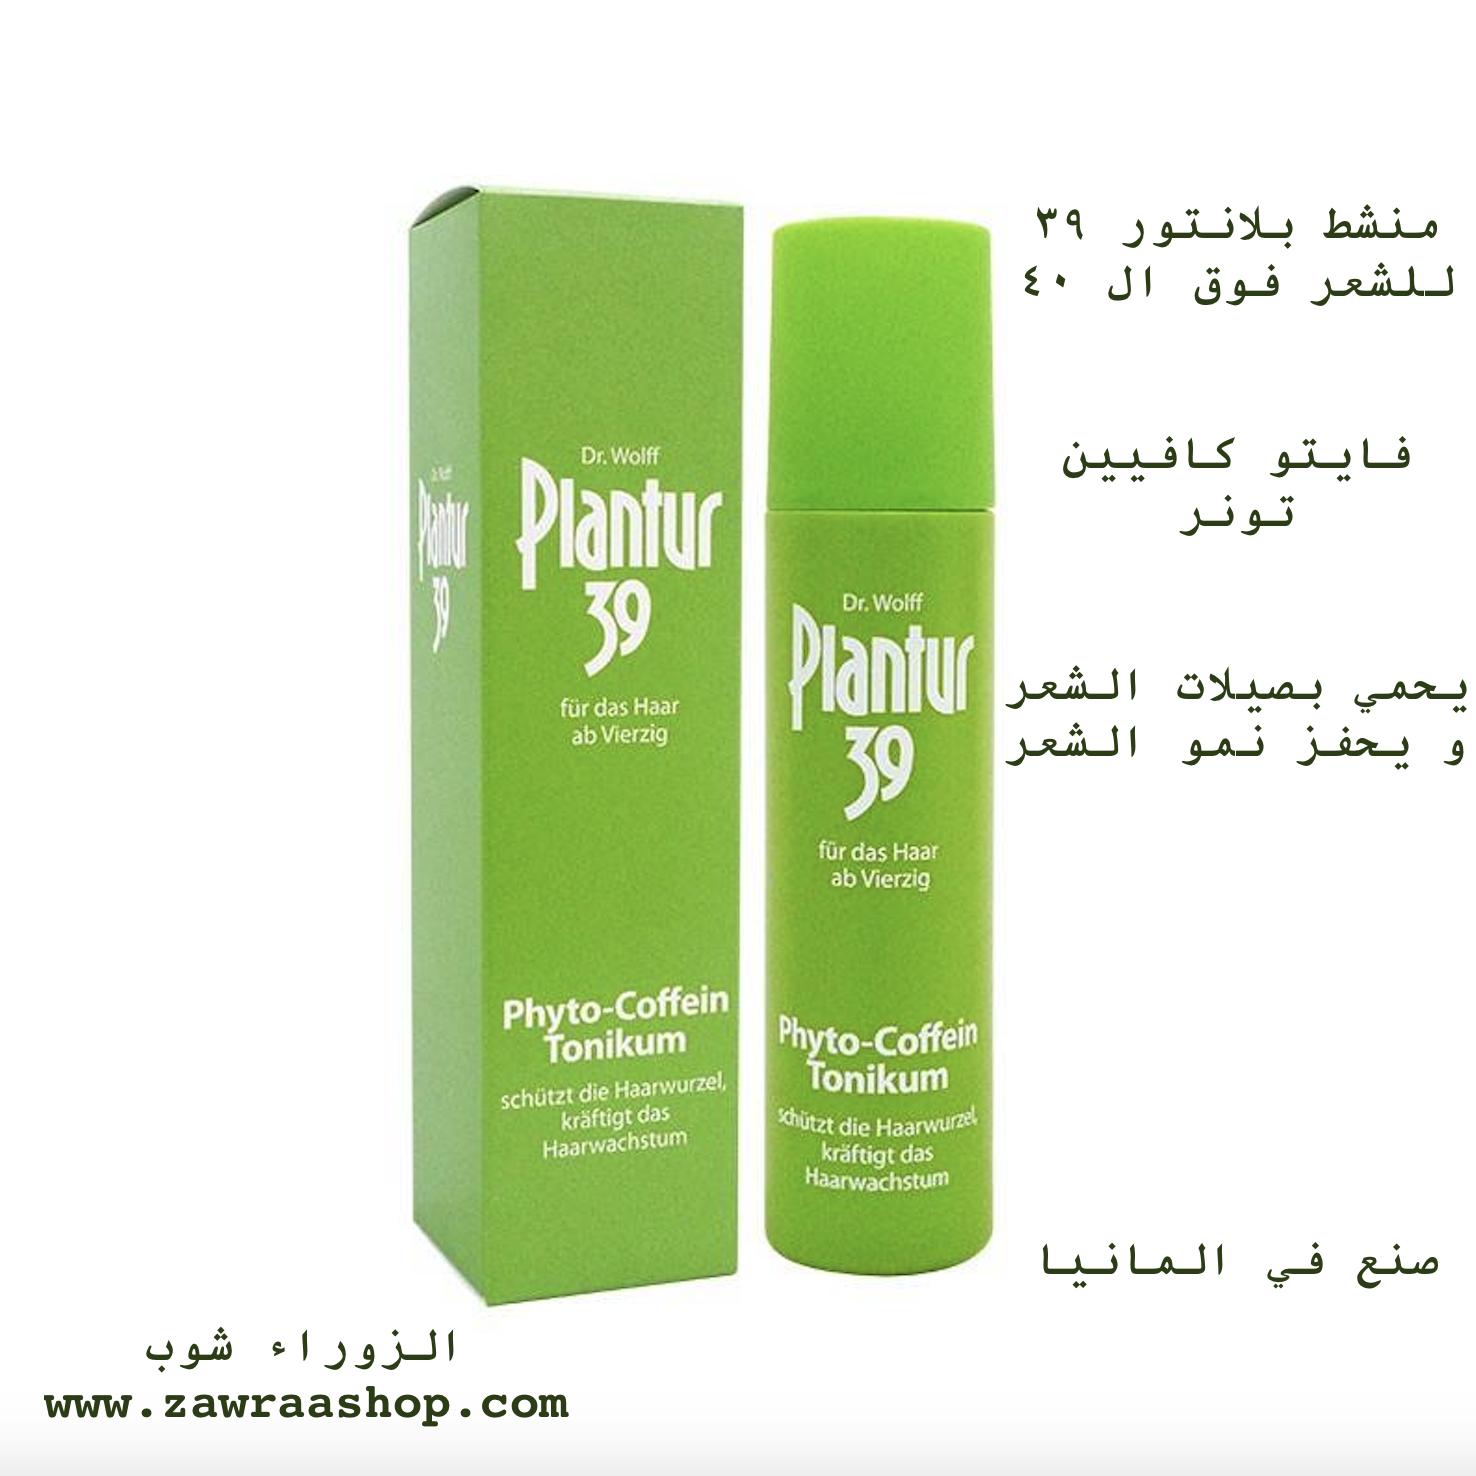 B403 plantur 39 phyto-coffein tonikum 200ml سائل بلانتور المحفز الالماني 00441